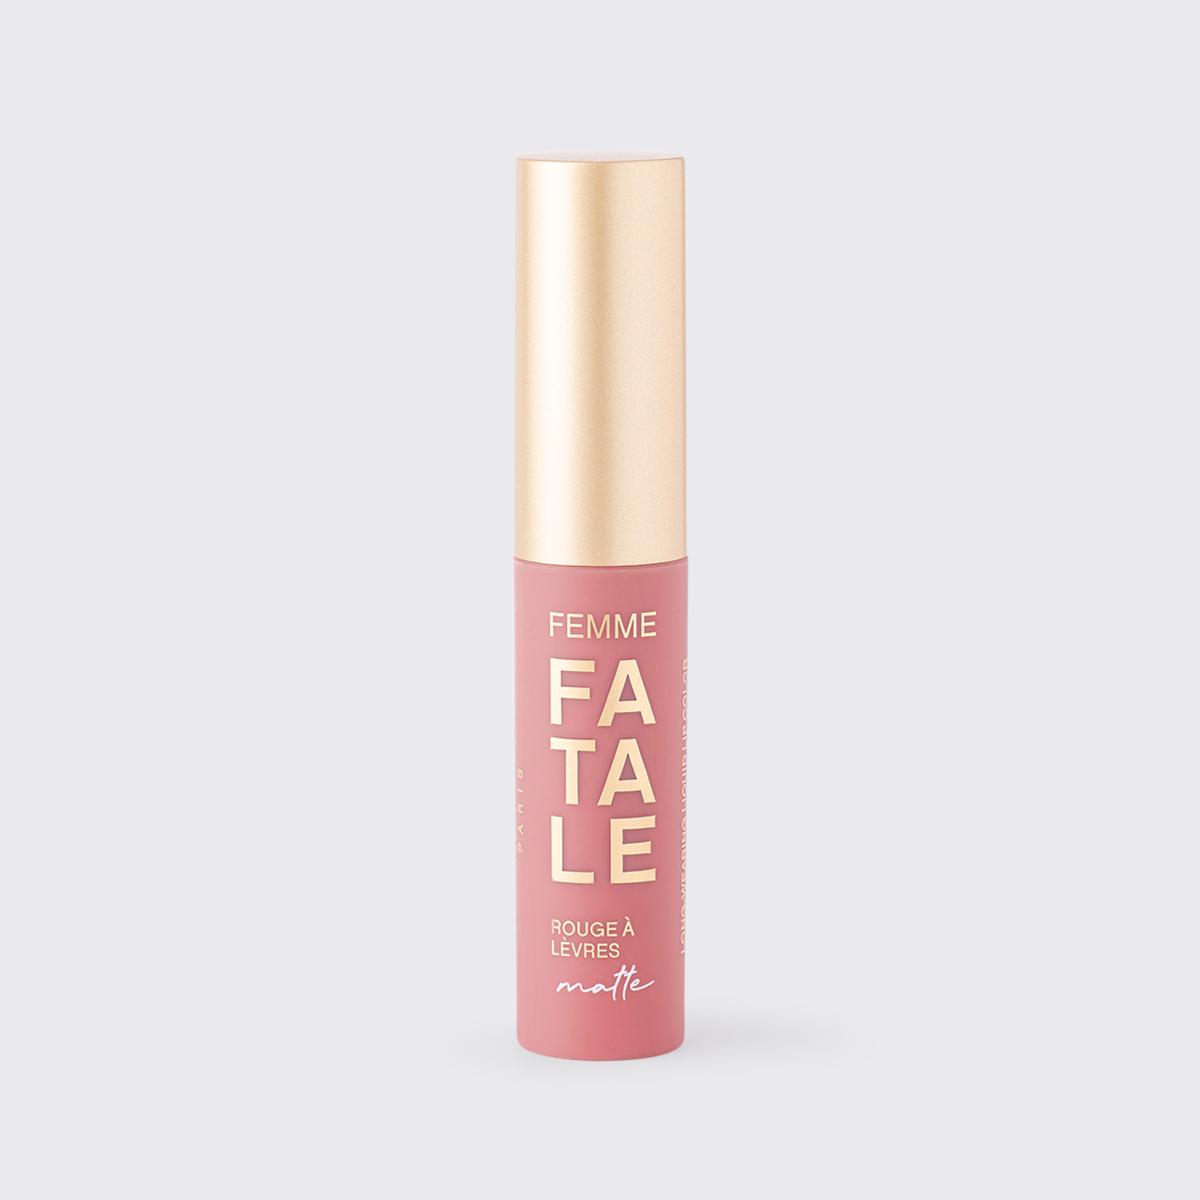 Vivienne Sabo - Matt Liquid Lip Color FEMME FATALE Lippenstift